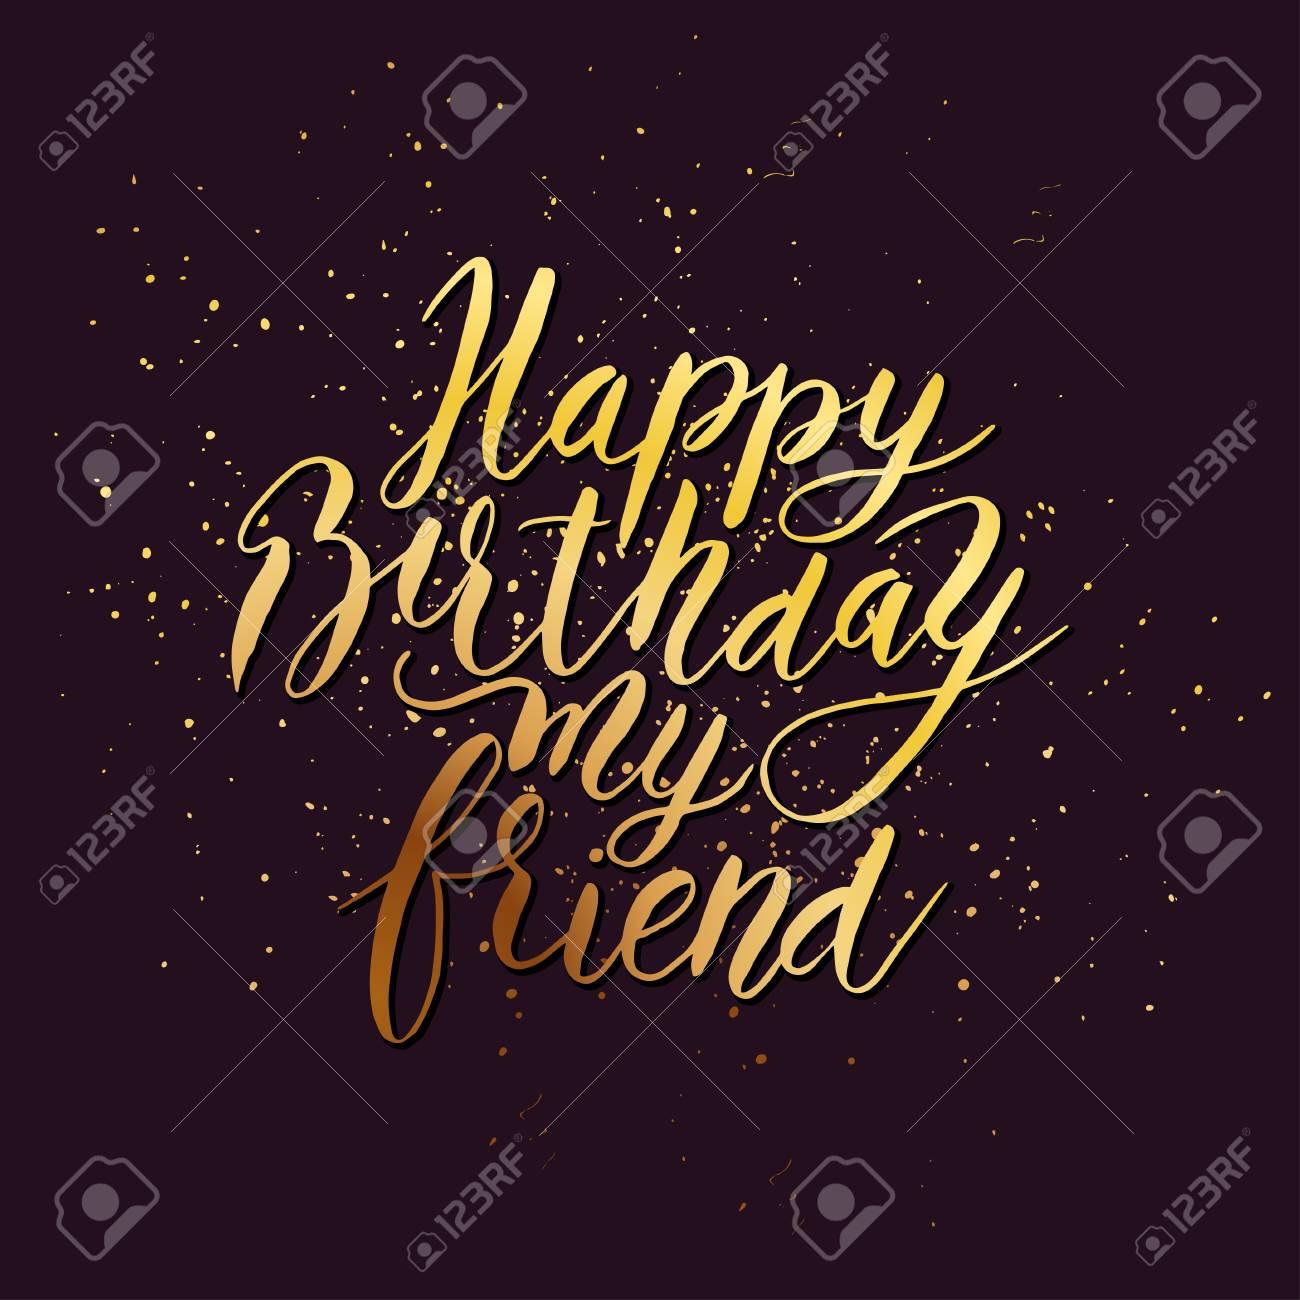 Happy Birthday Friend Images.Happy Birthday Friend Congratulating Hand Drawn Quote